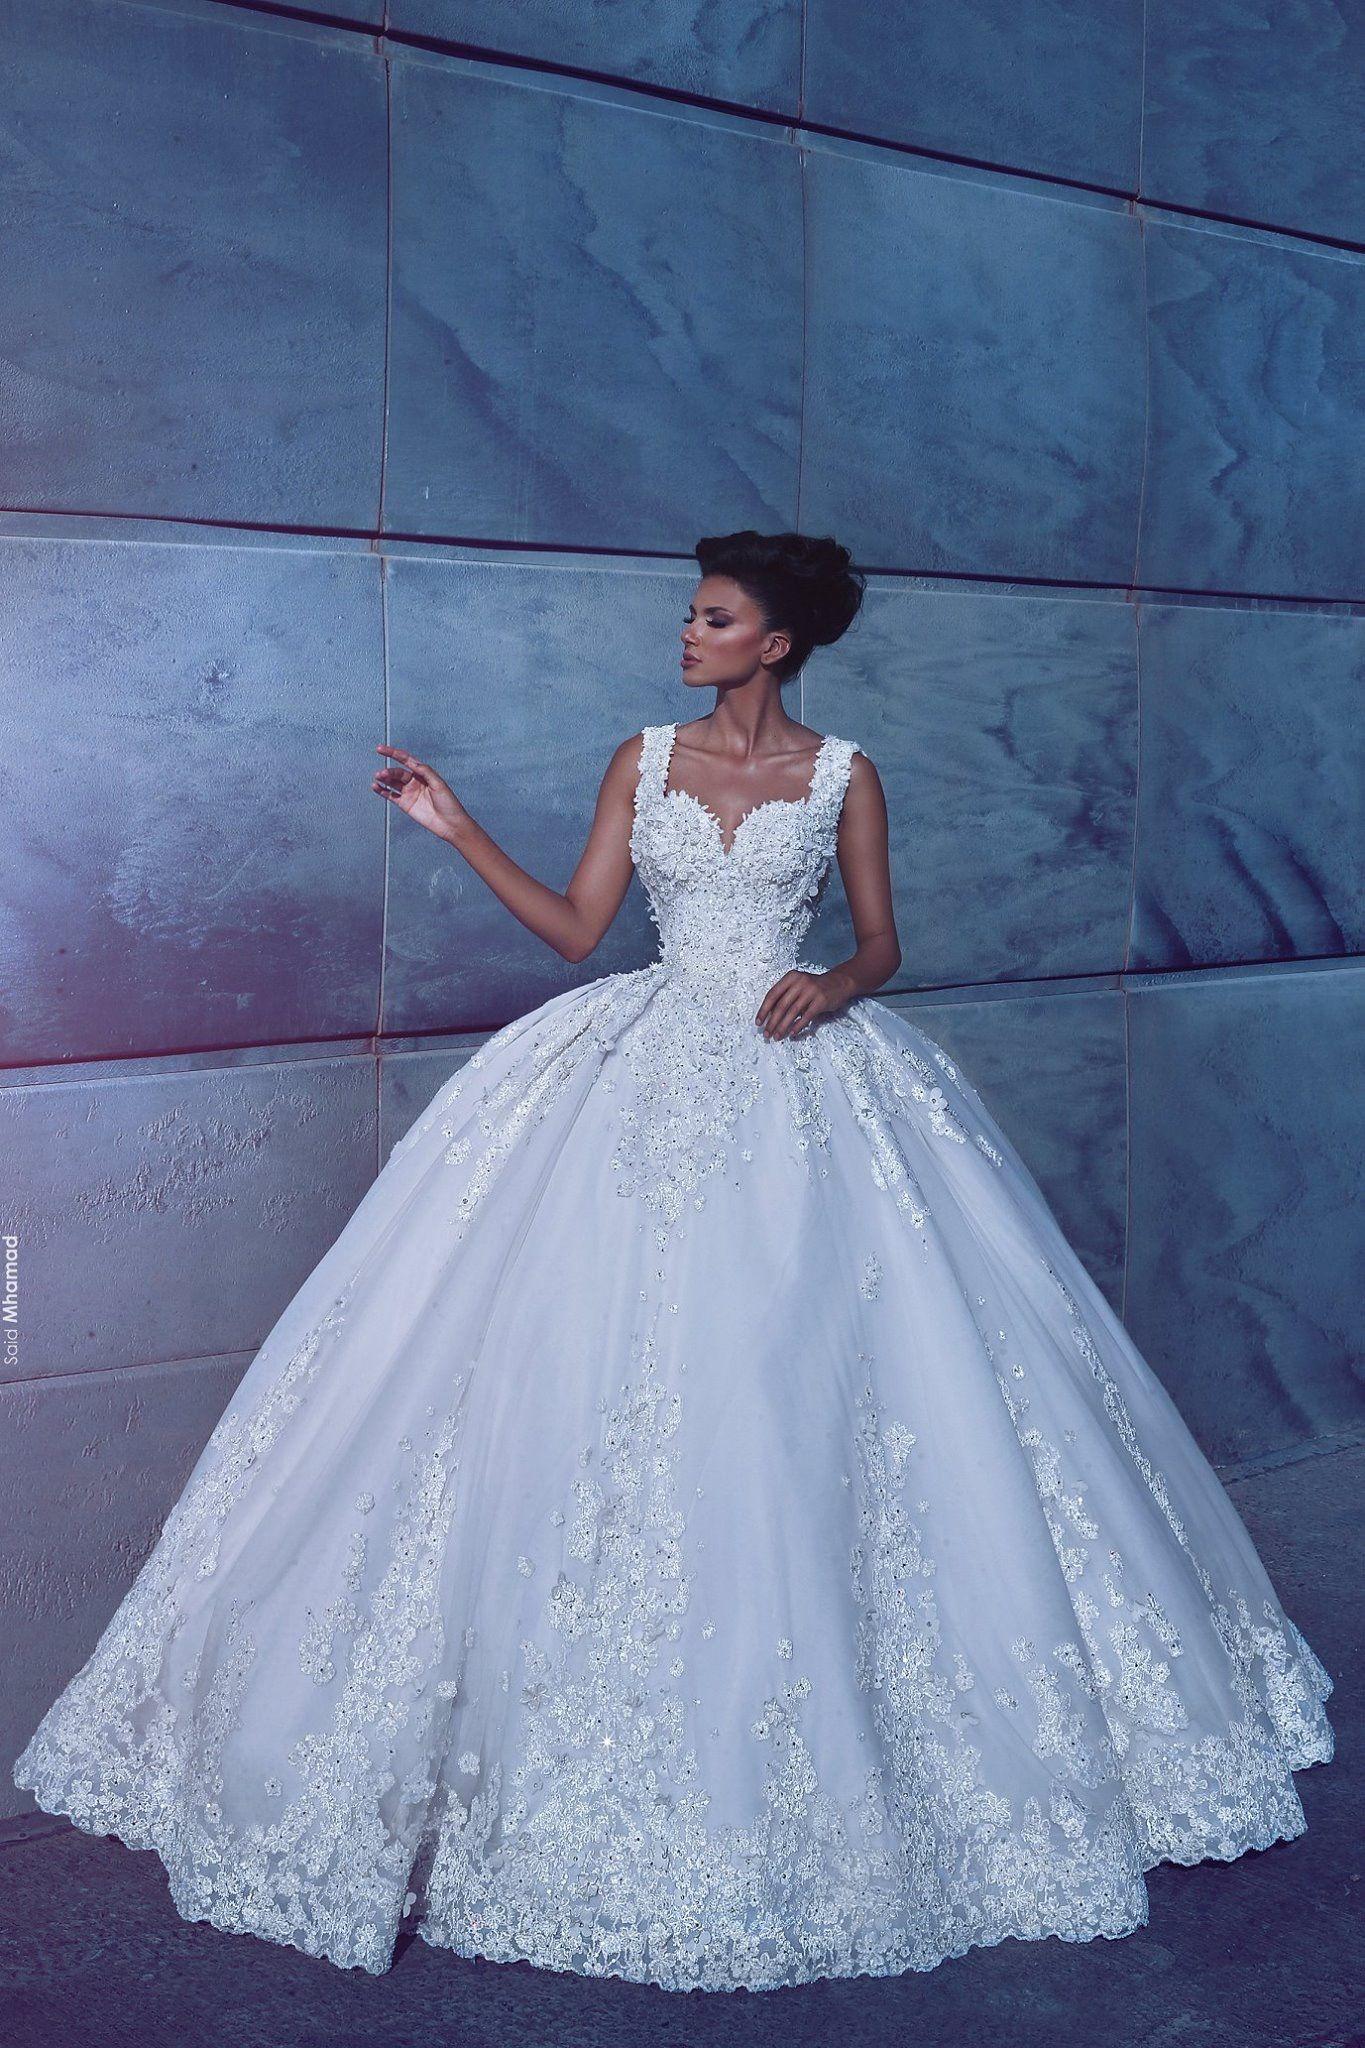 Mayada Sahmarani Haute Couture | The Dress | Pinterest | Wedding ...